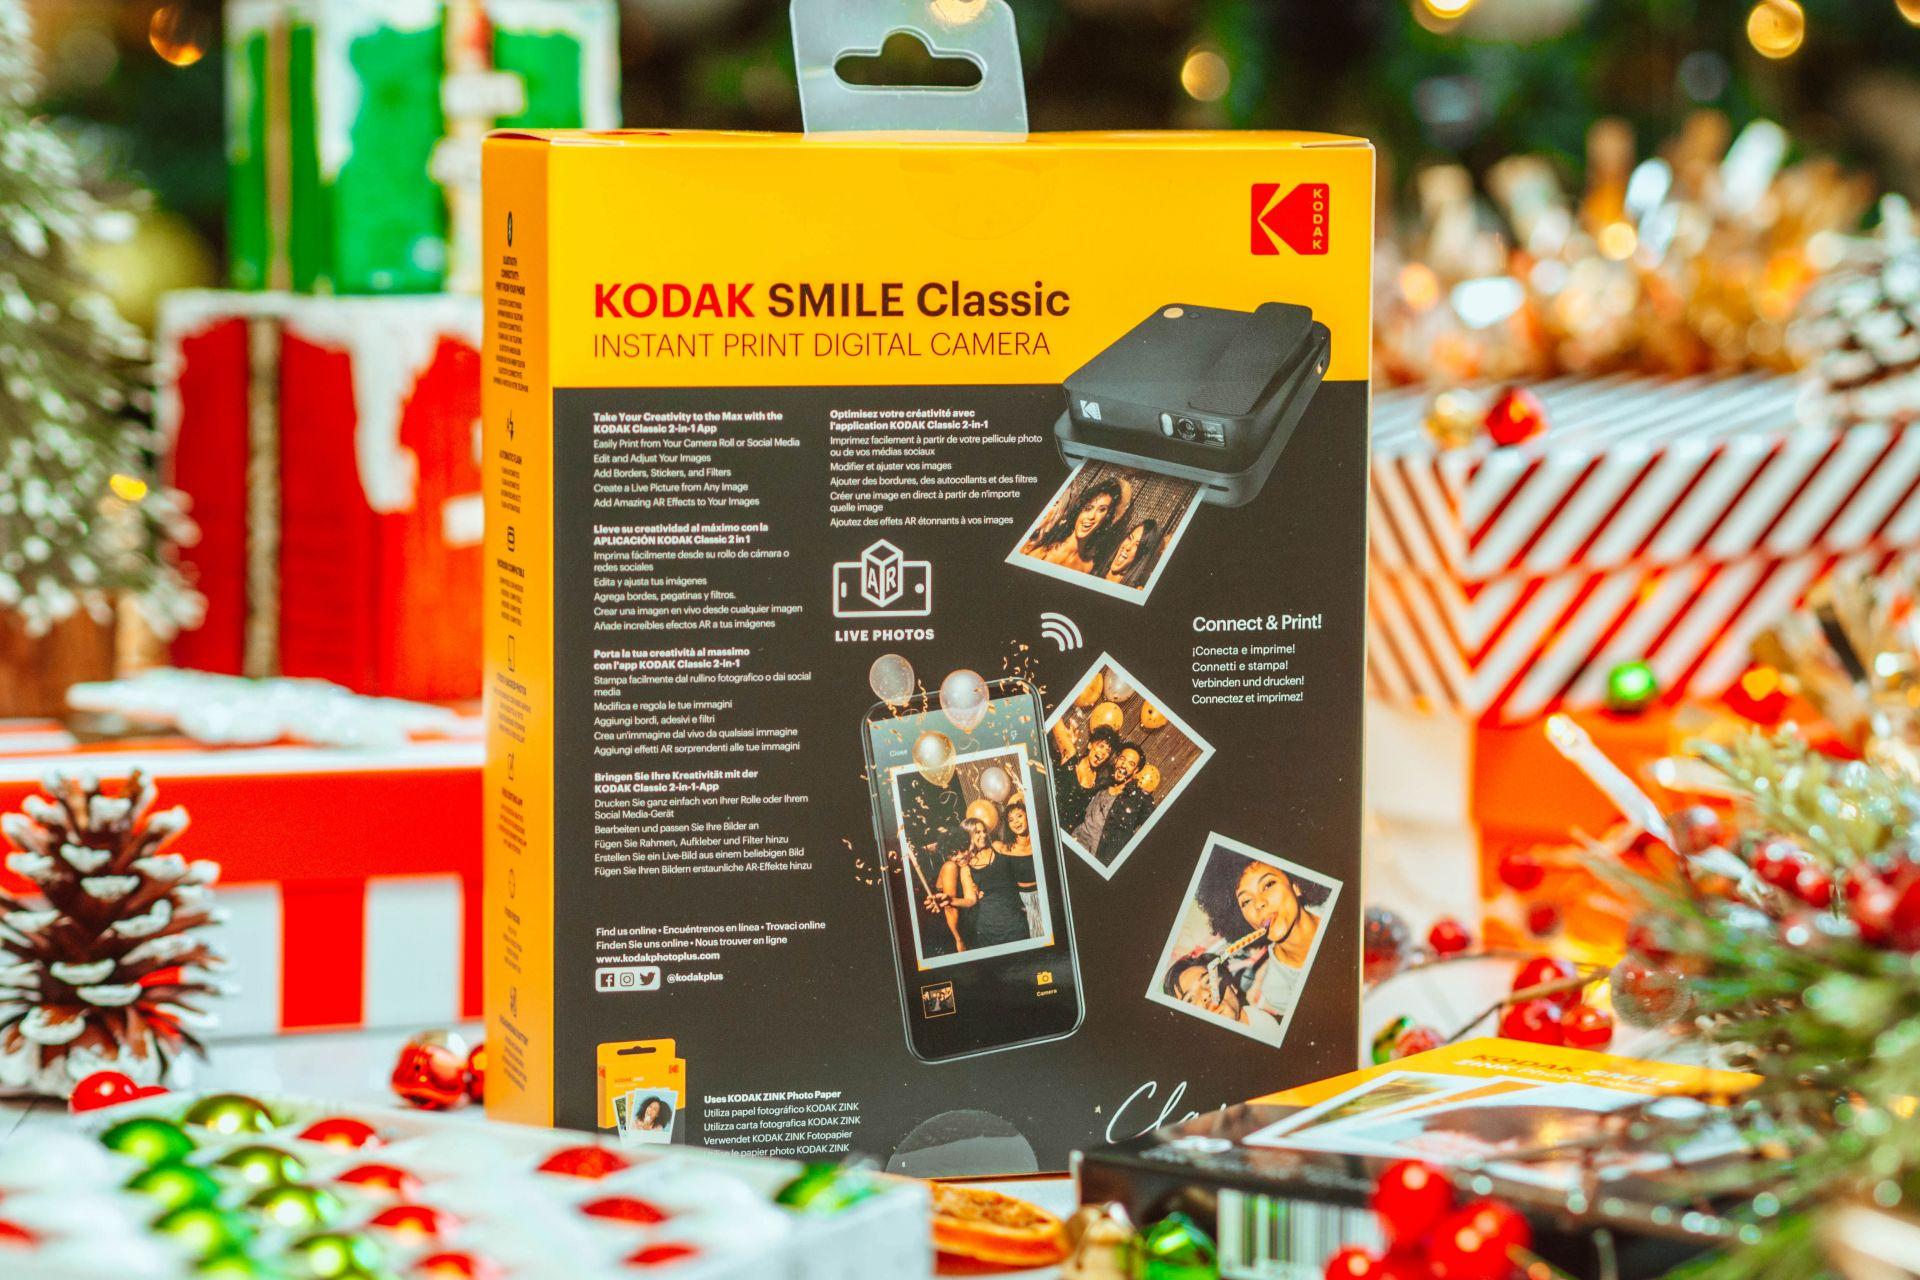 KODAK SMILE Classic Digital Instant Camera - Christmas Gifts for men